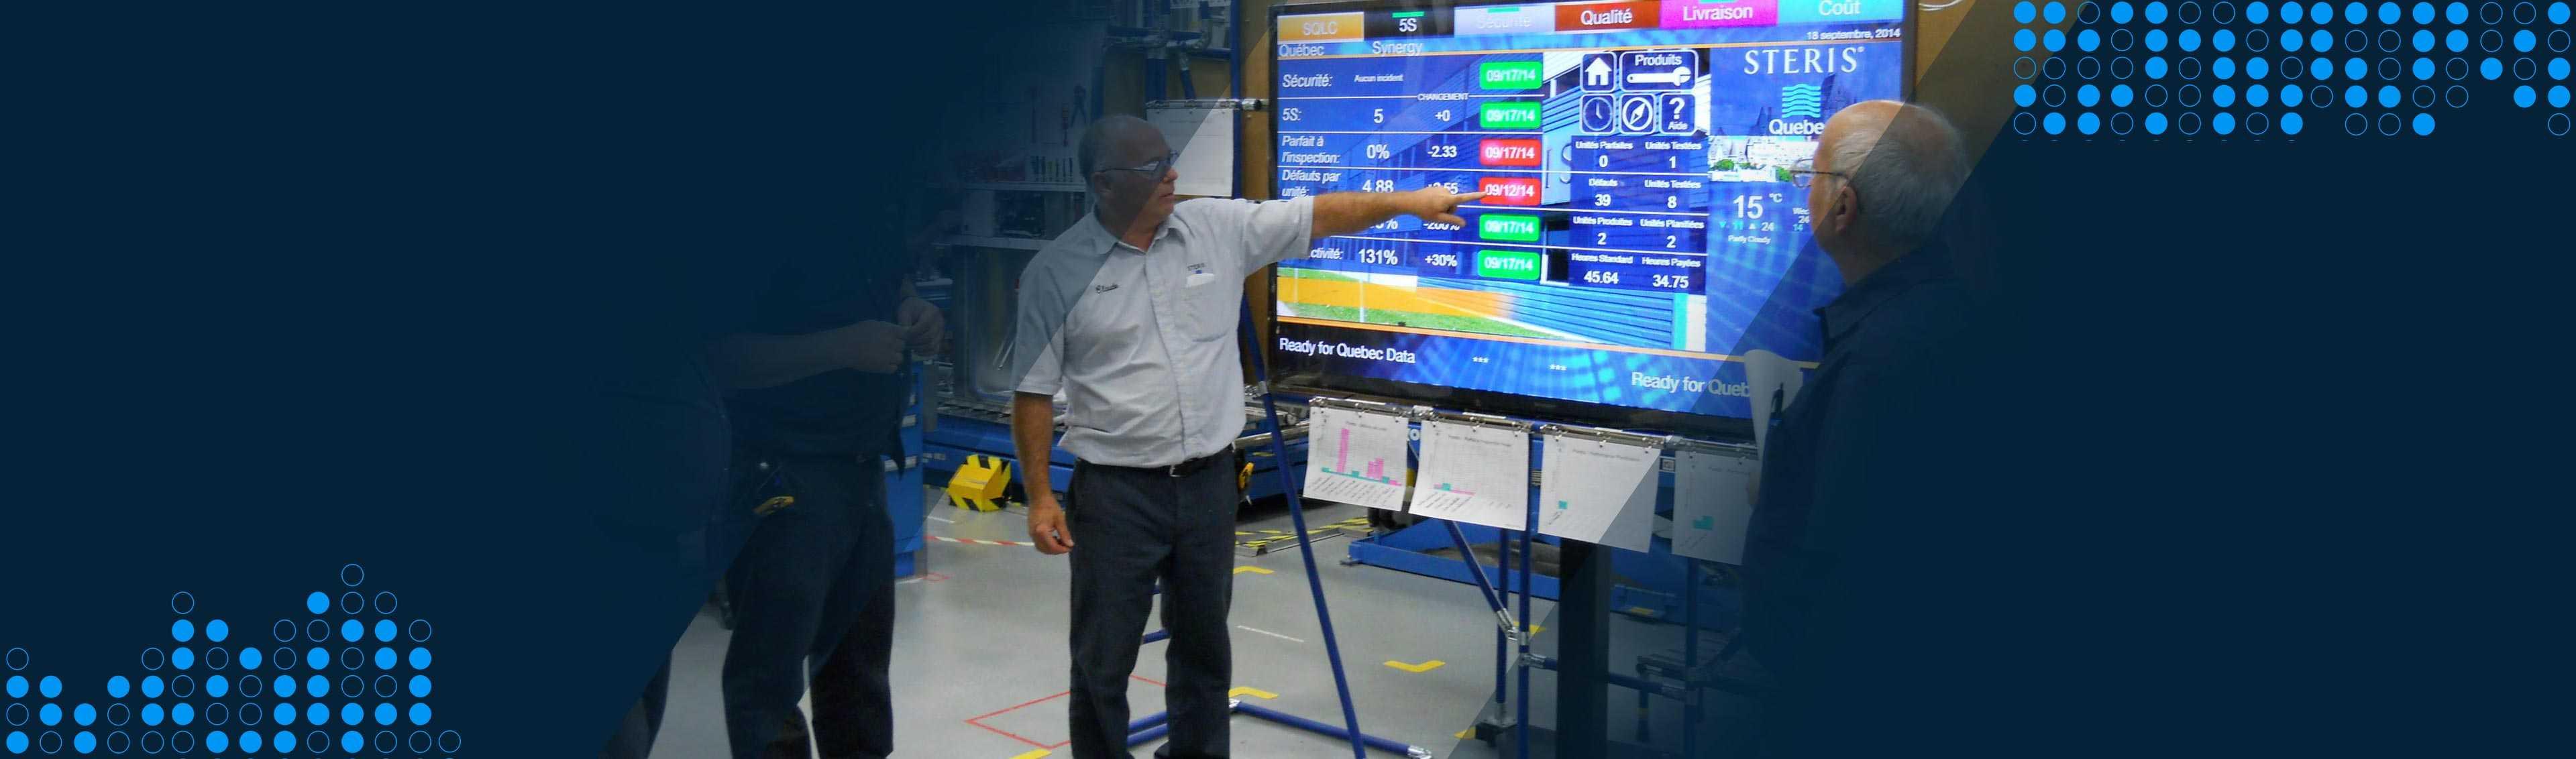 digital screen in manufacturing facility